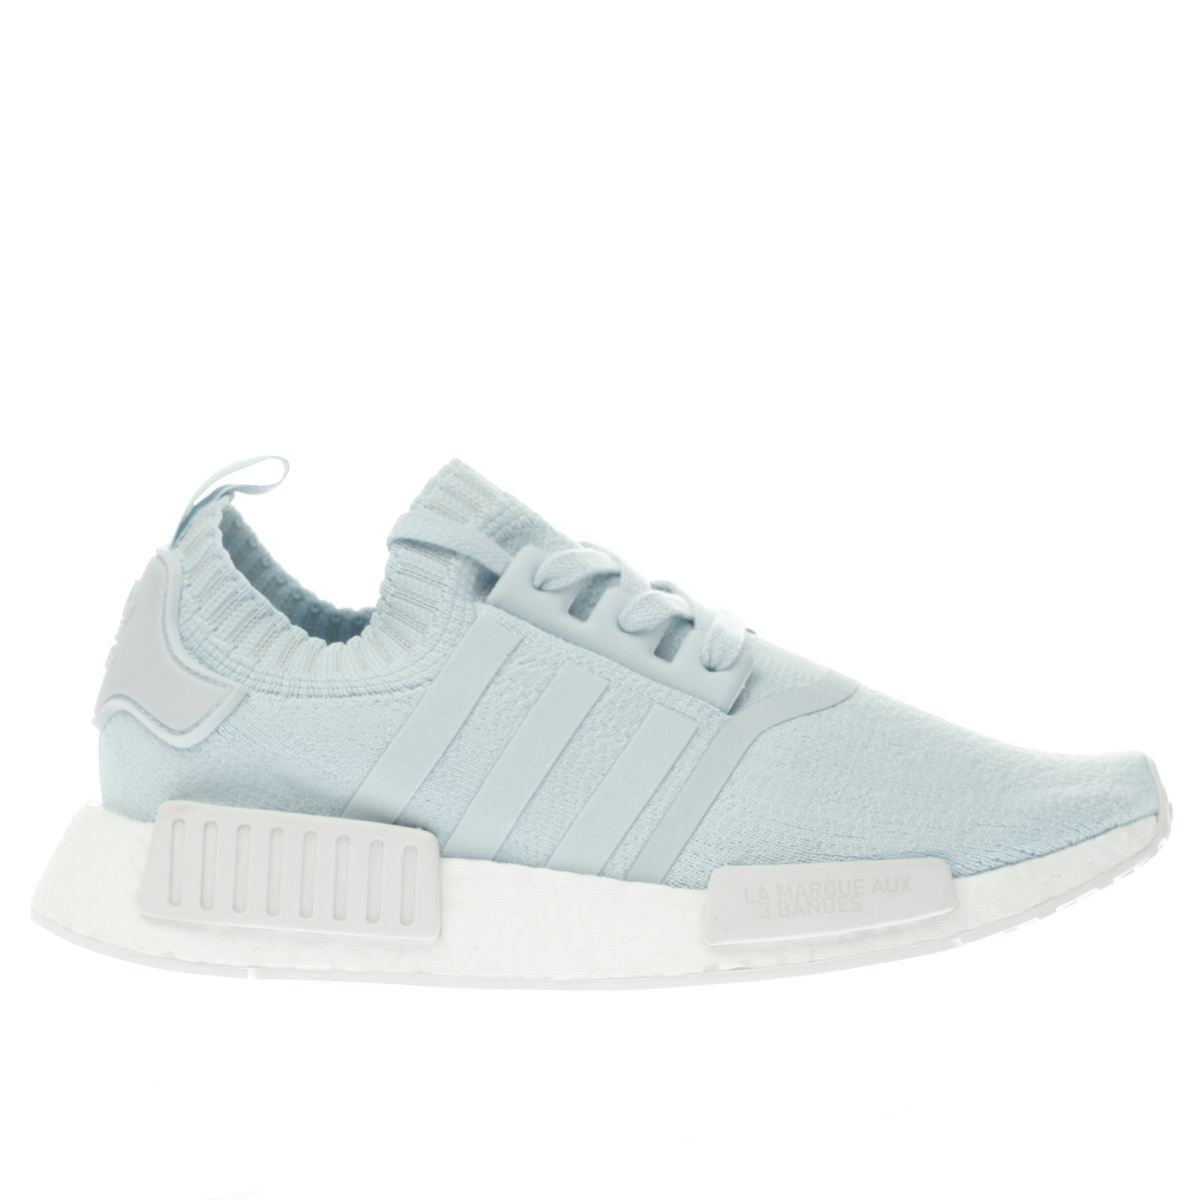 adidas pale blue nmd_r1 primeknit trainers